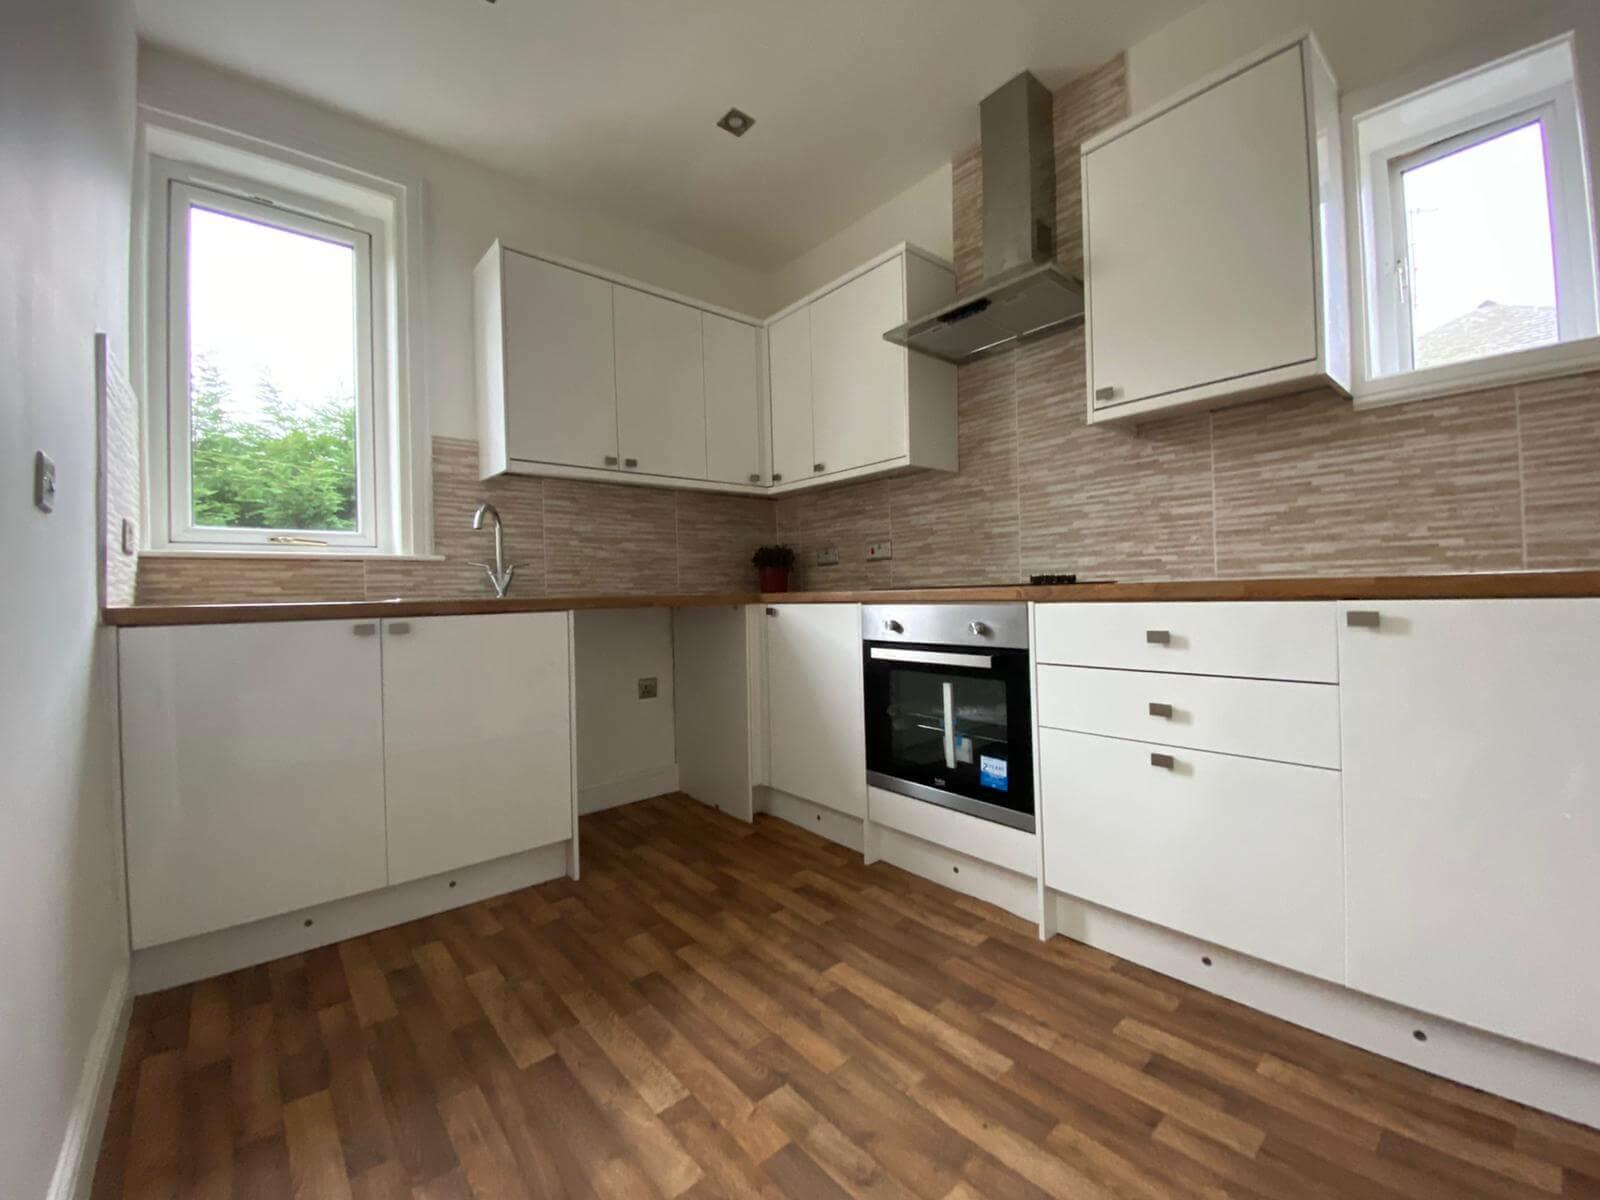 fitted kitchens glasgow area FIX LTD